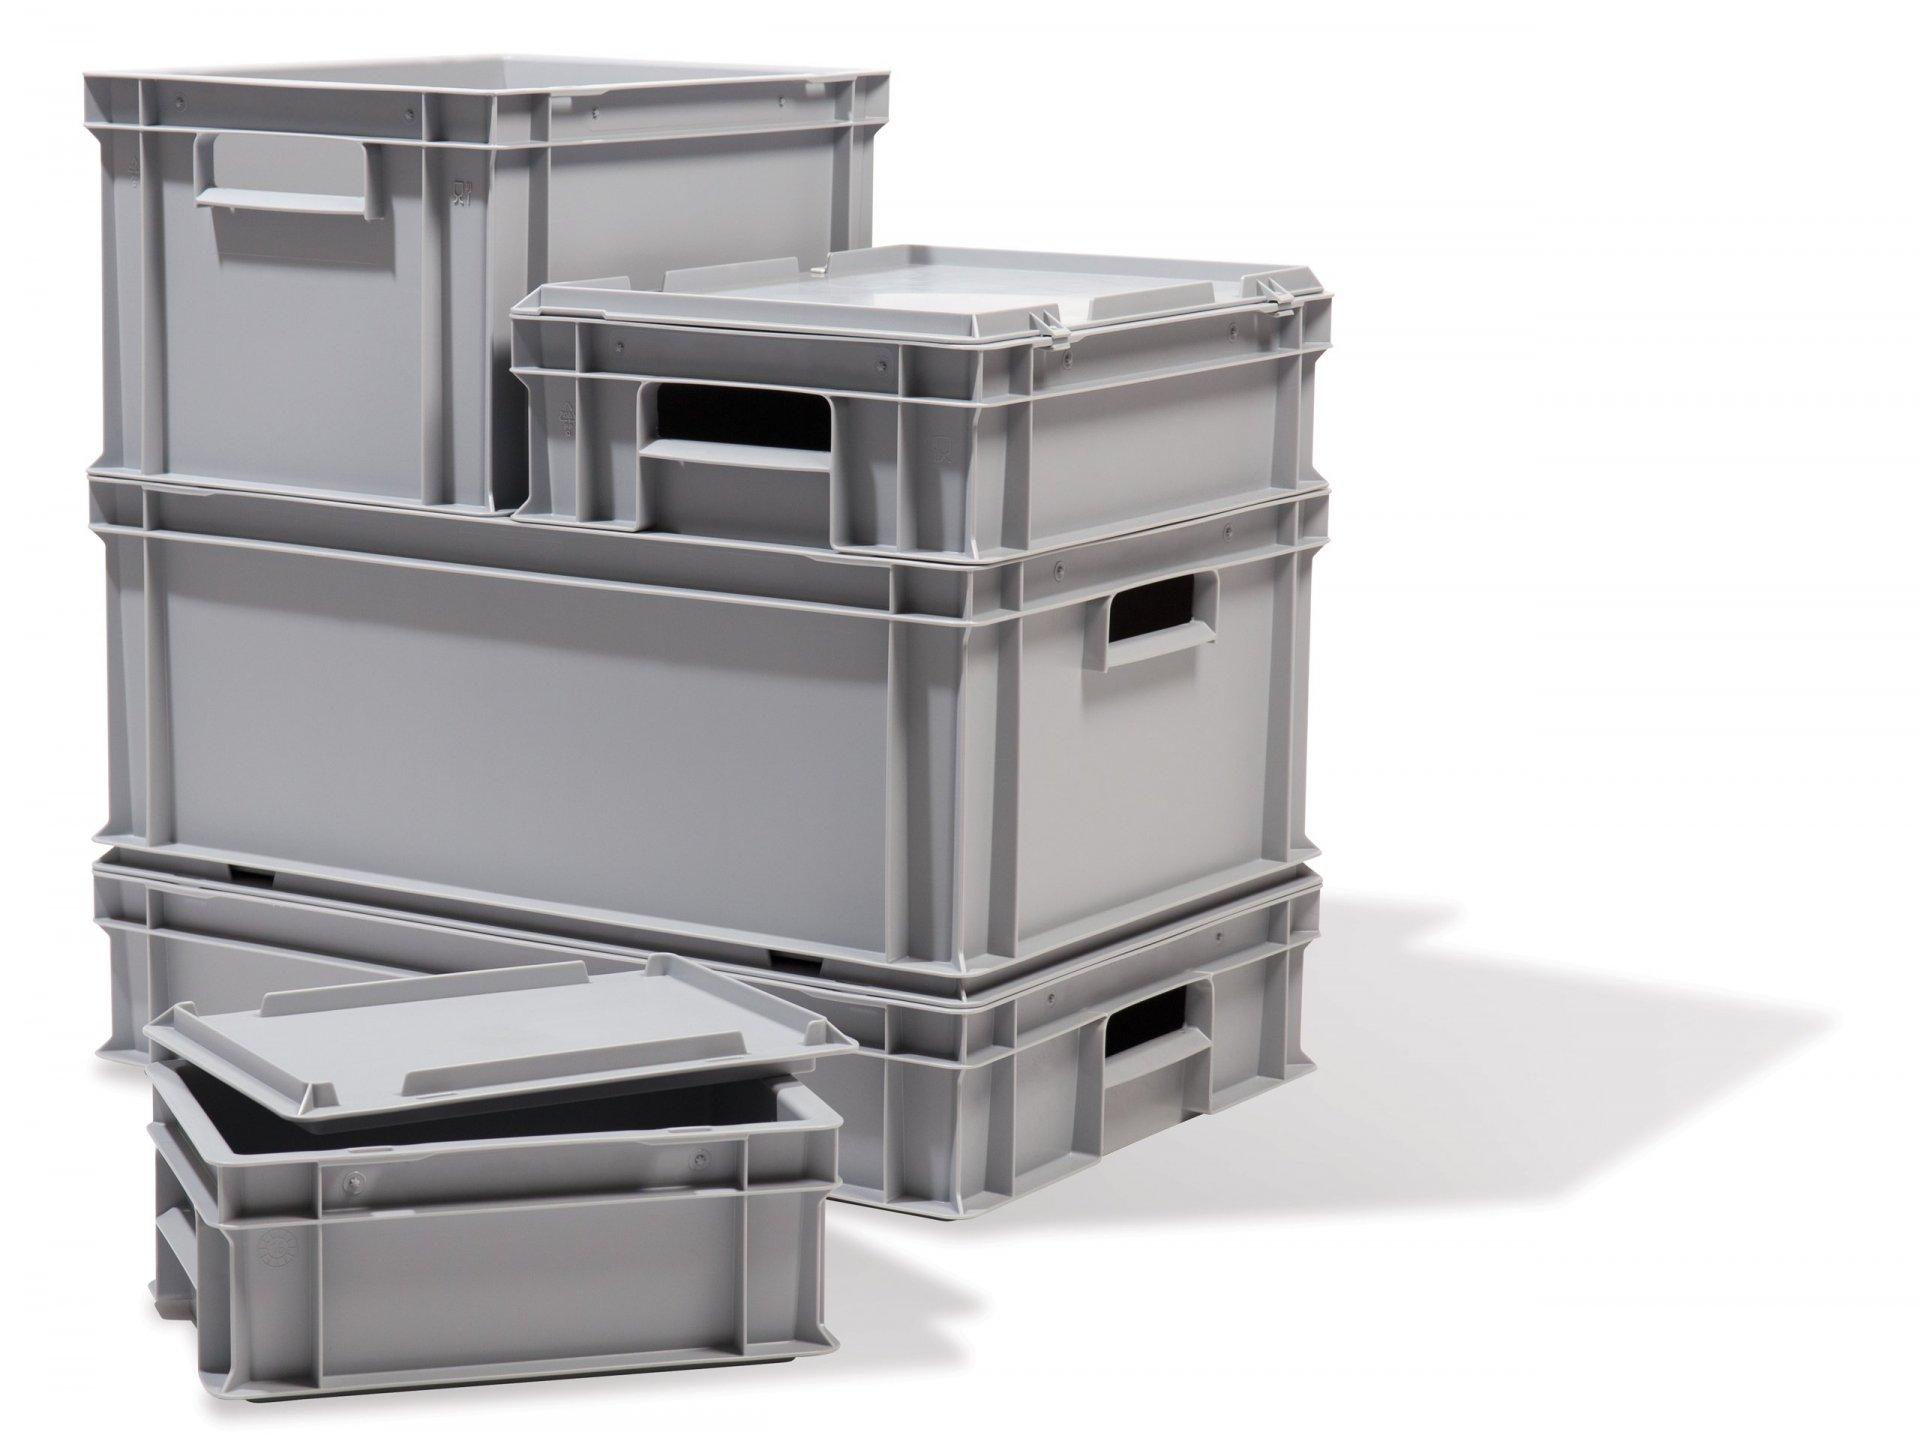 stapelkiste grau verschlie bar kaufen modulor. Black Bedroom Furniture Sets. Home Design Ideas